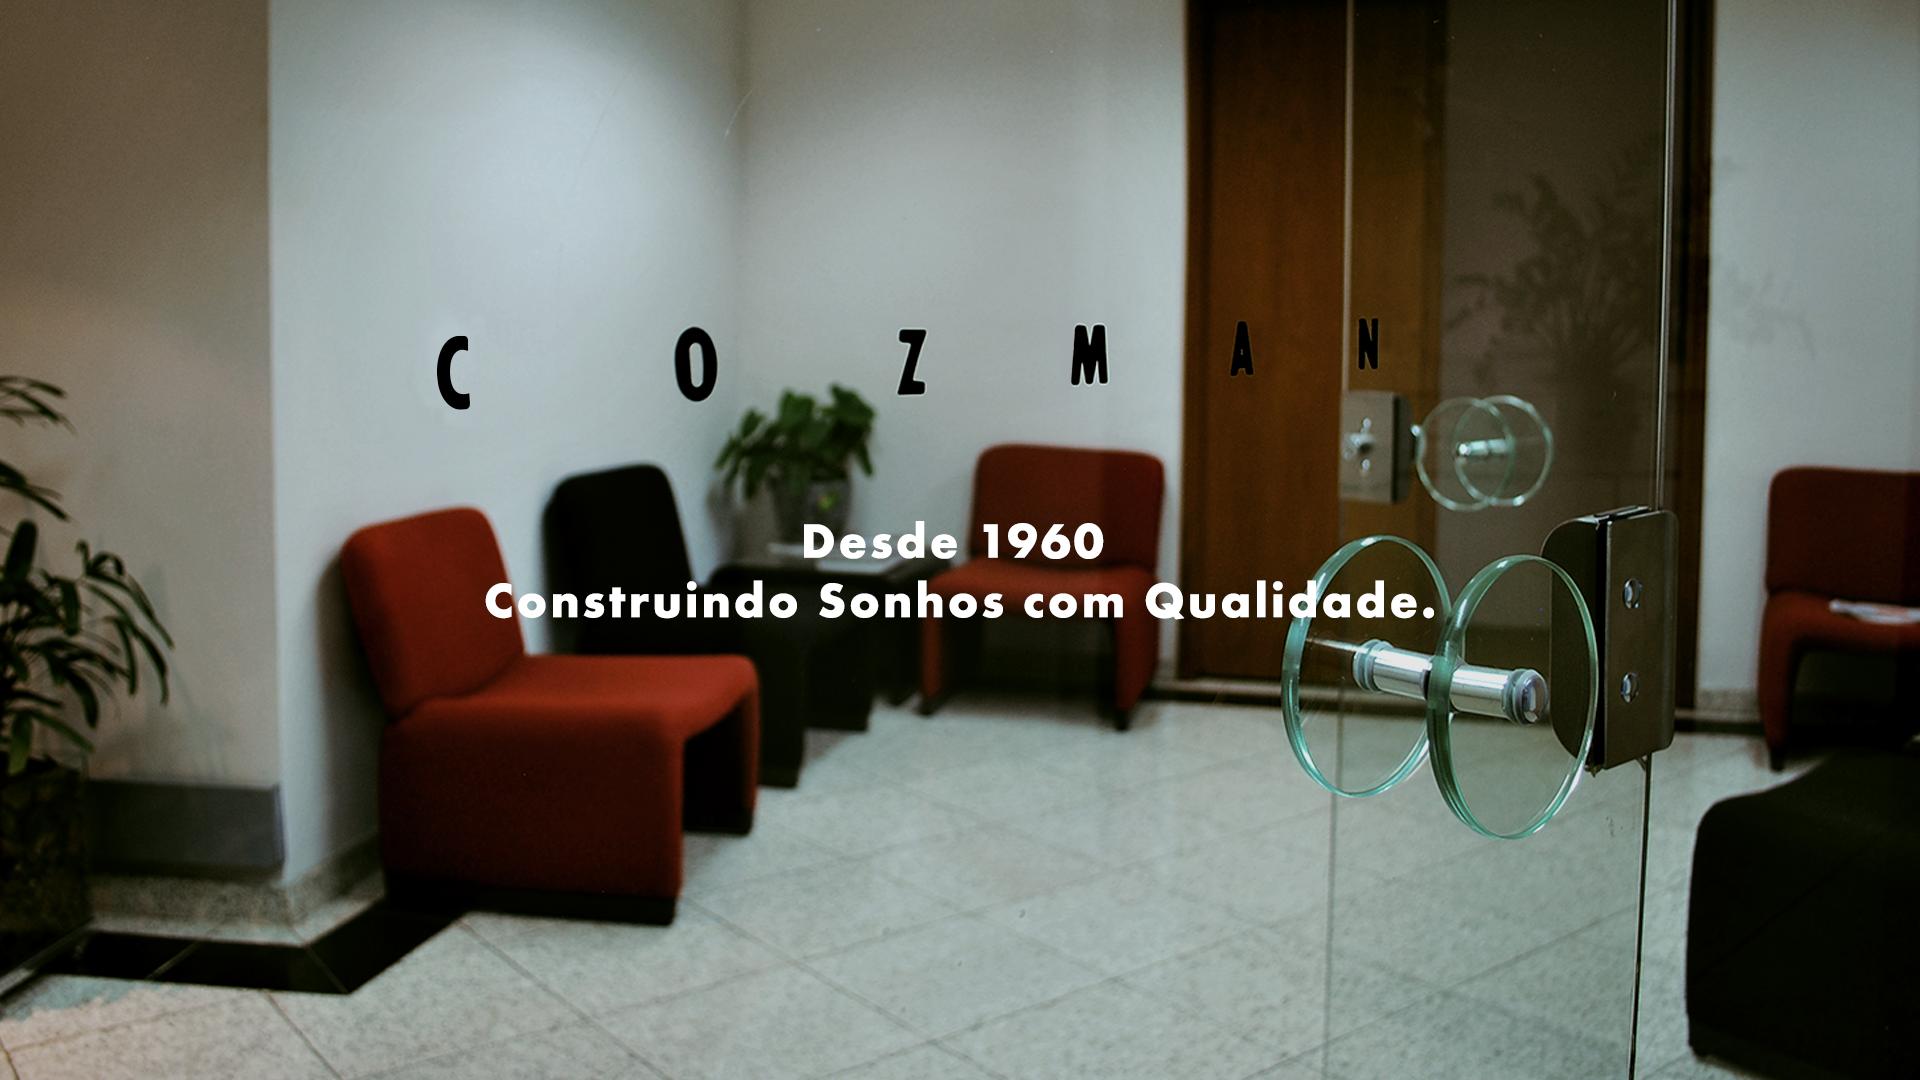 Construtora Cozman